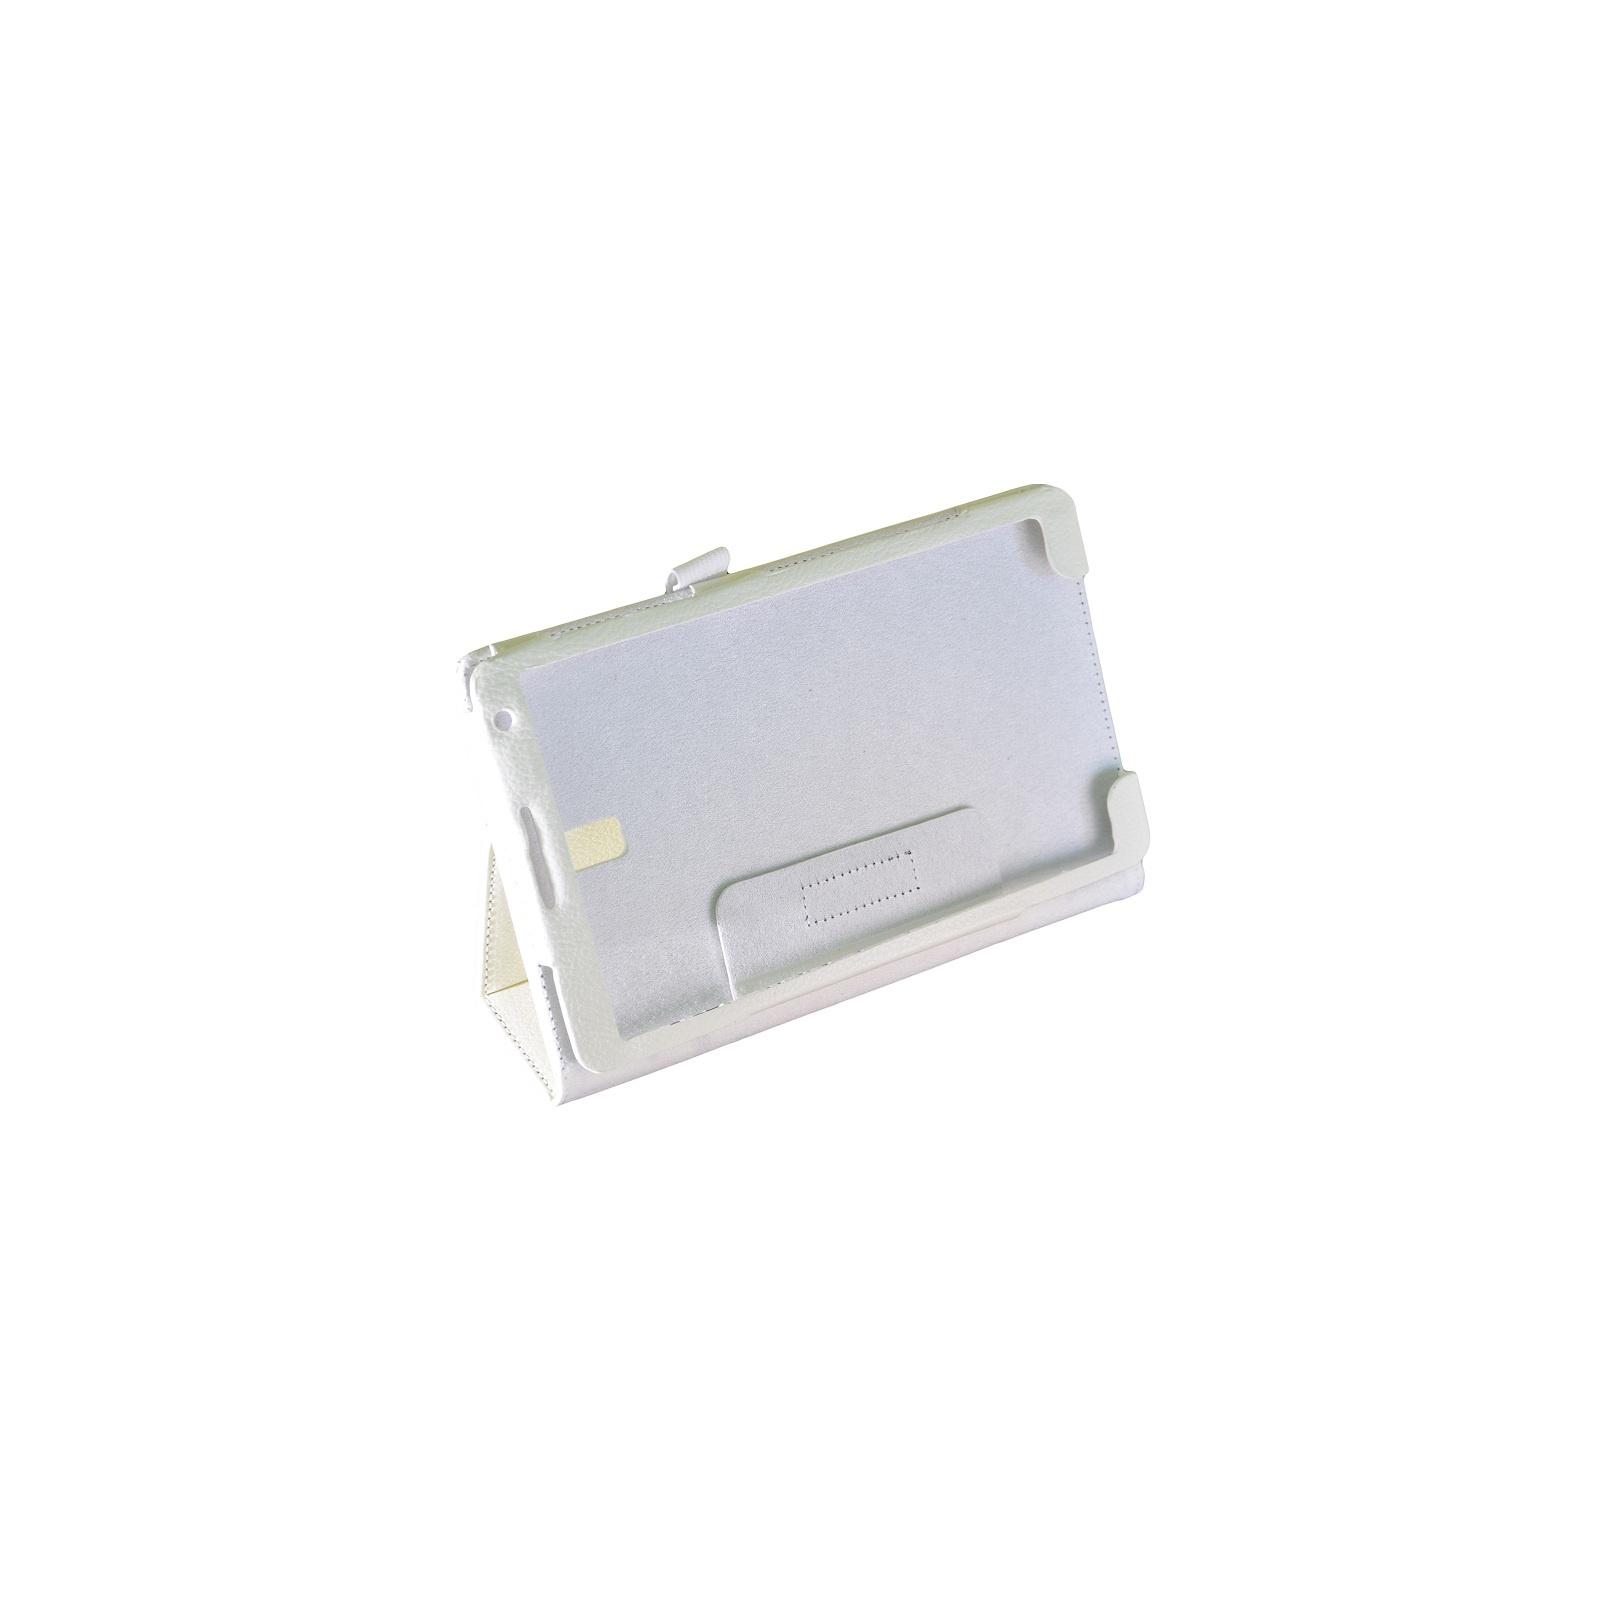 "Чехол для планшета Pro-case 8,4"" SM-T700 Galaxy Tab S 8.4 wite (SM-T700w) изображение 4"